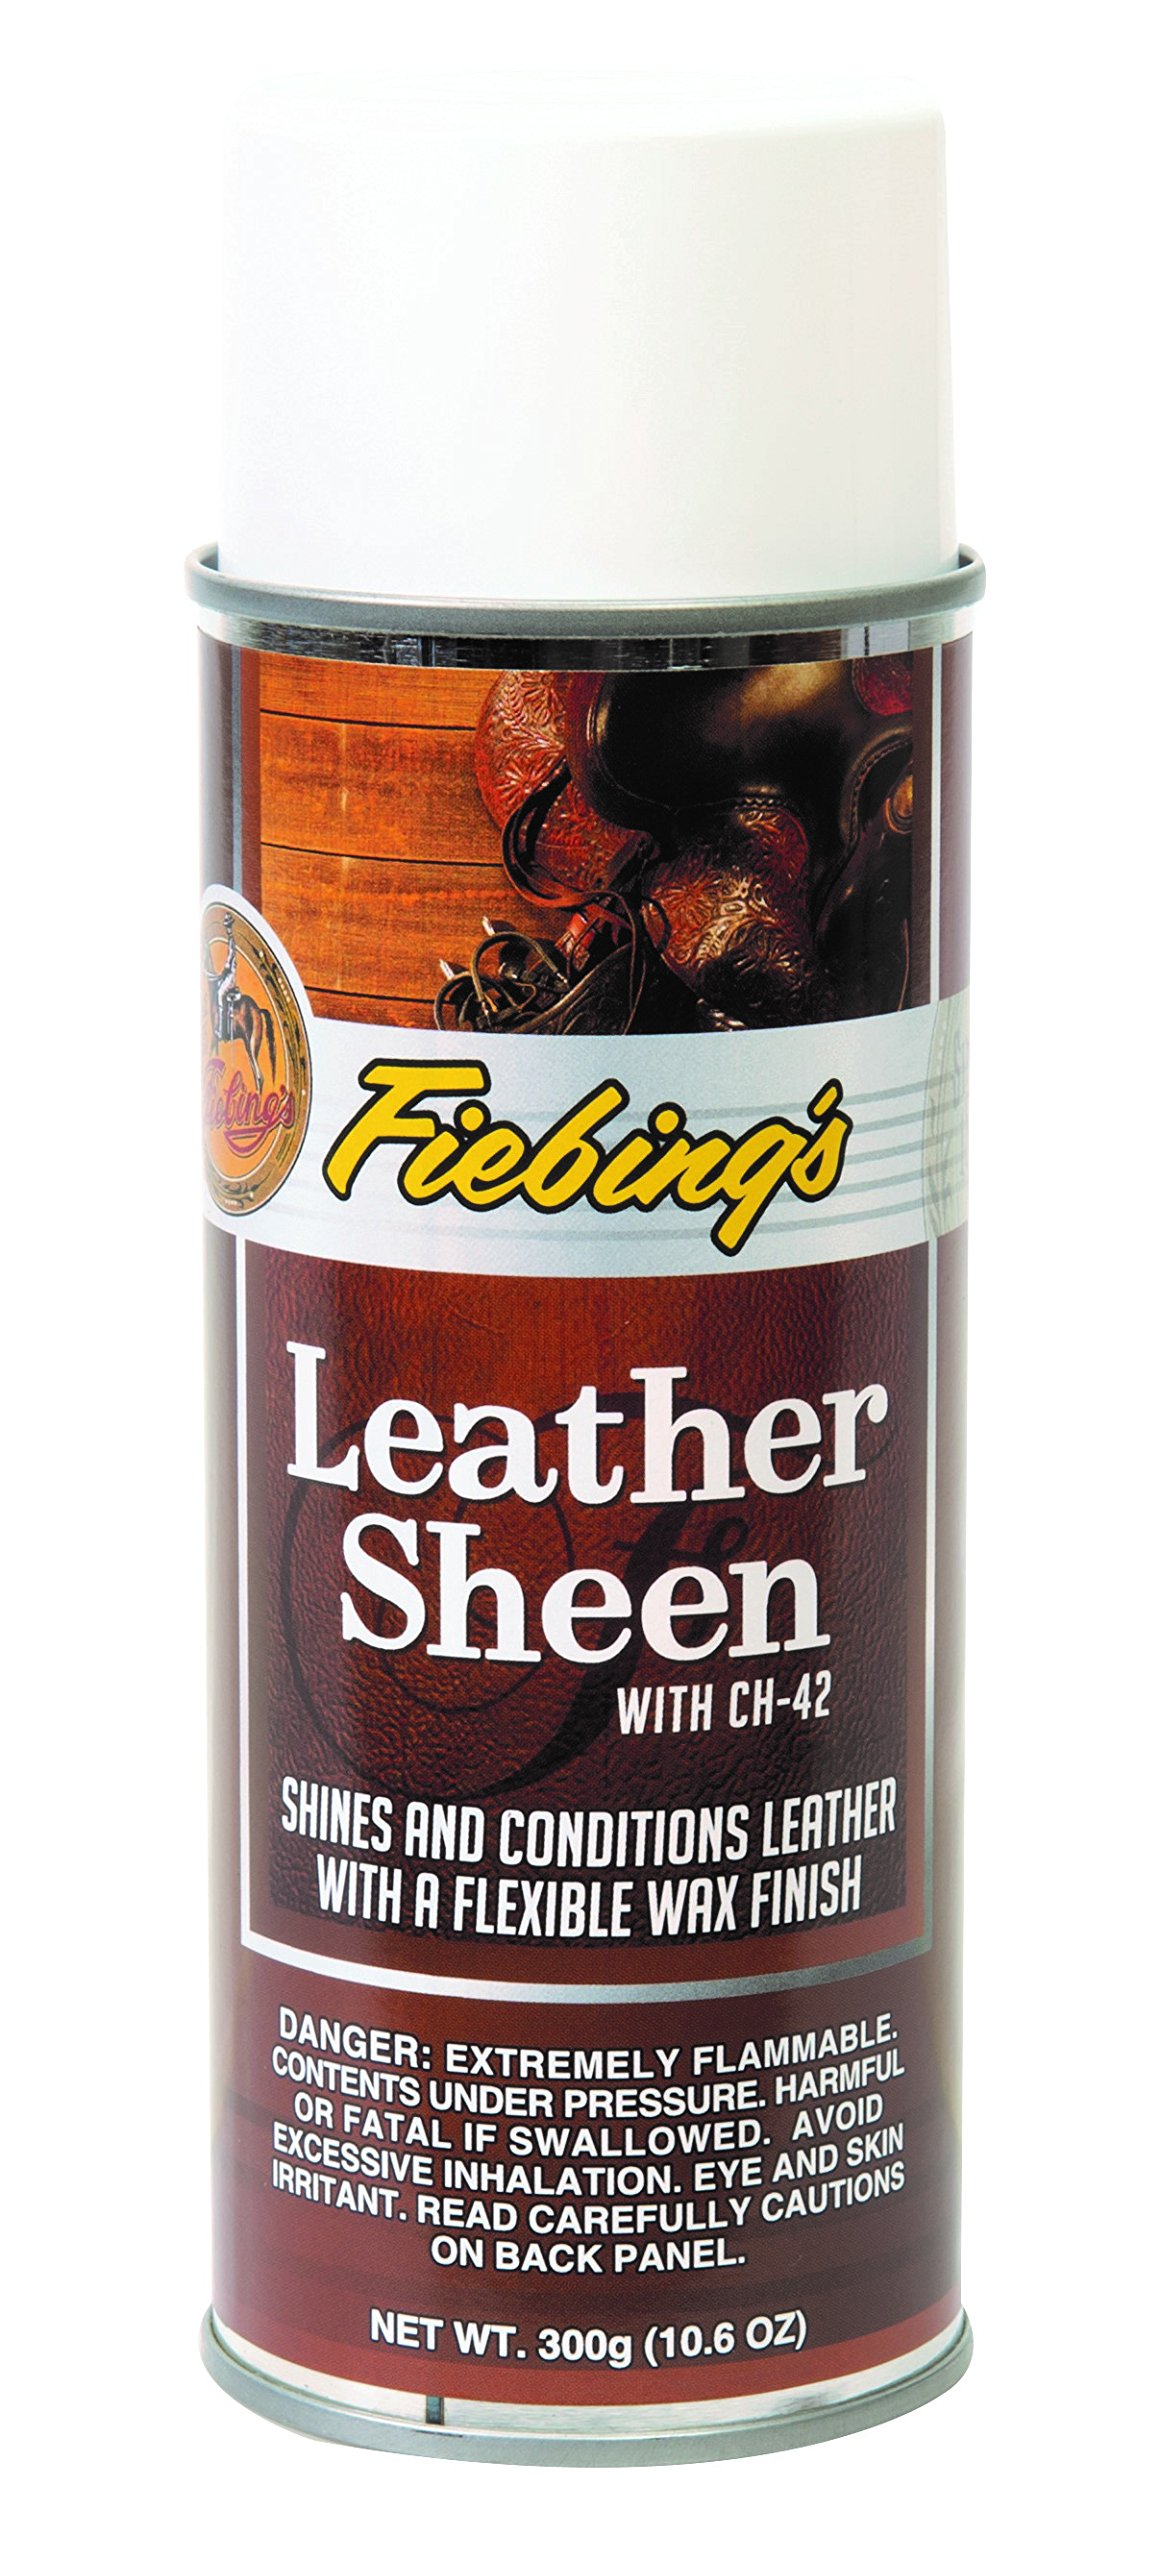 Fiebing's Leather Sheen, 10.6 oz, Clear